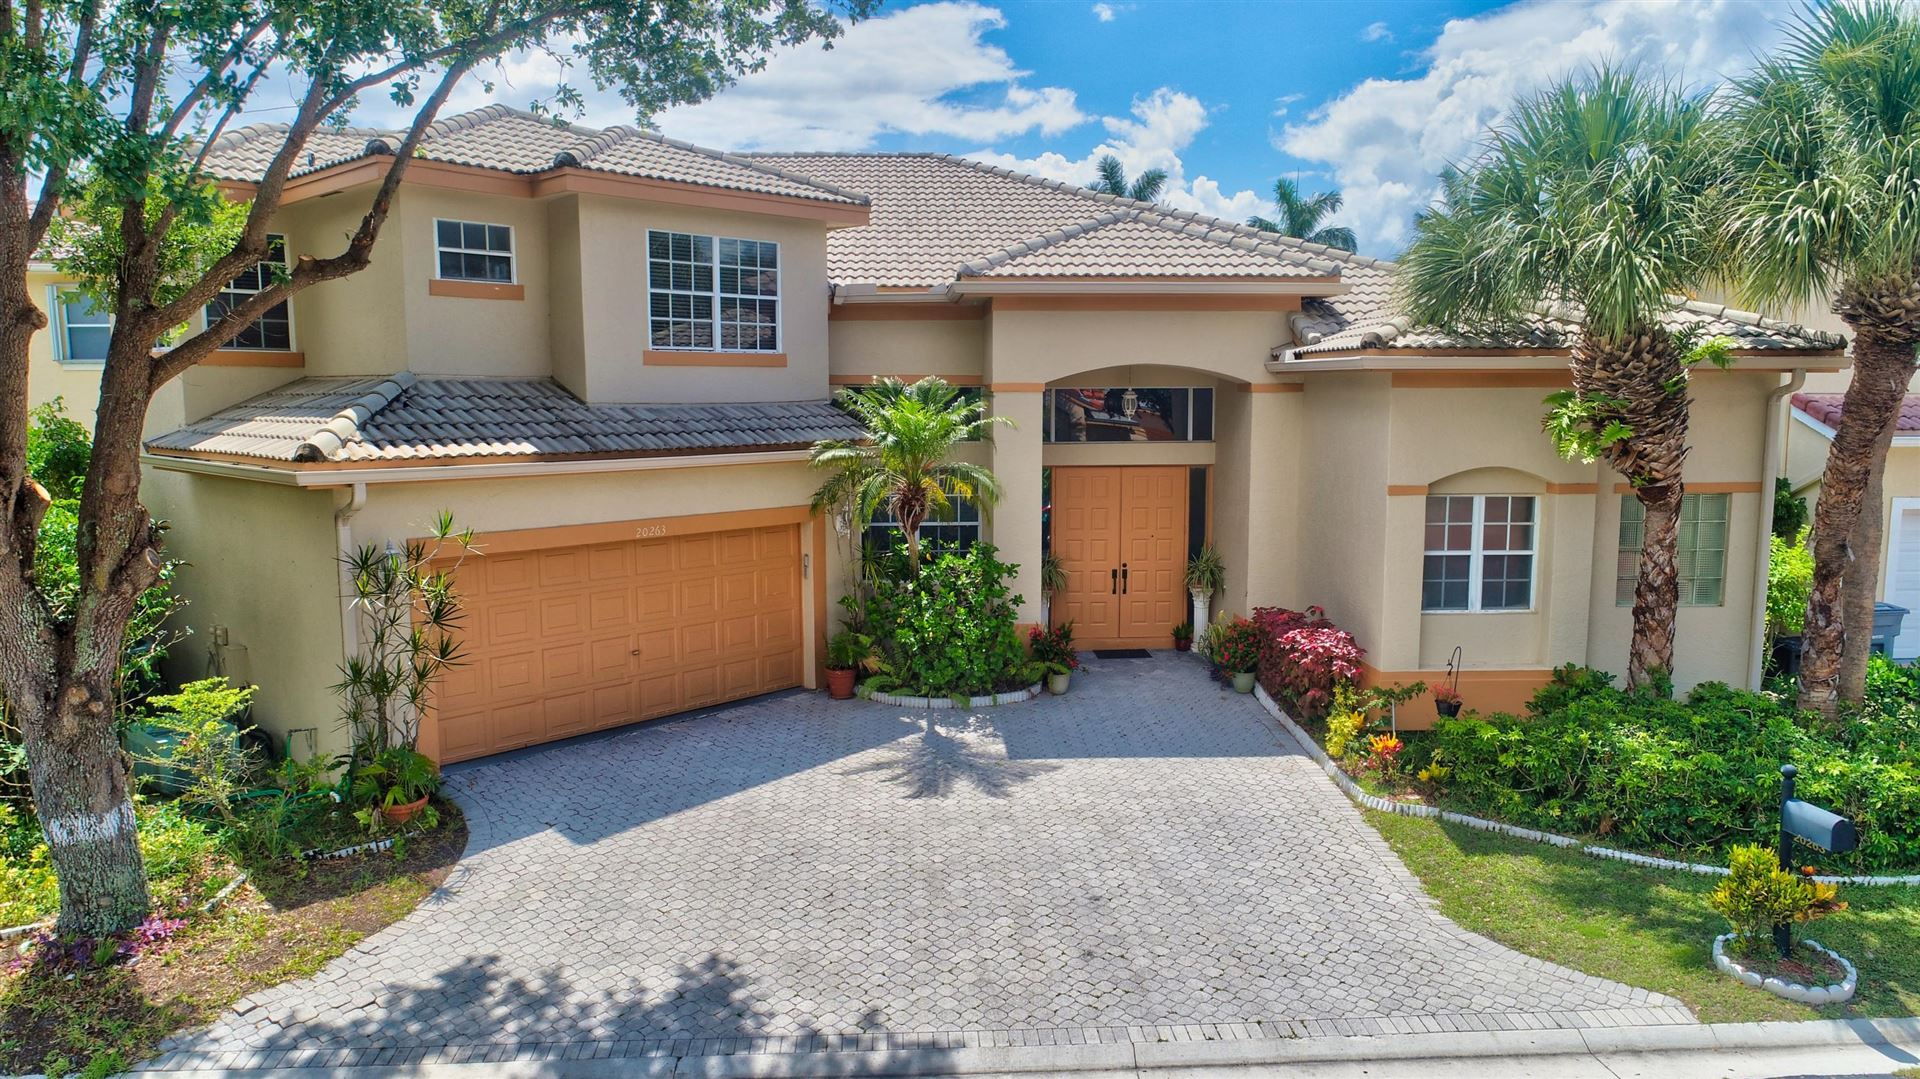 20263 Monteverdi Circle, Boca Raton, FL 33498 - #: RX-10623338